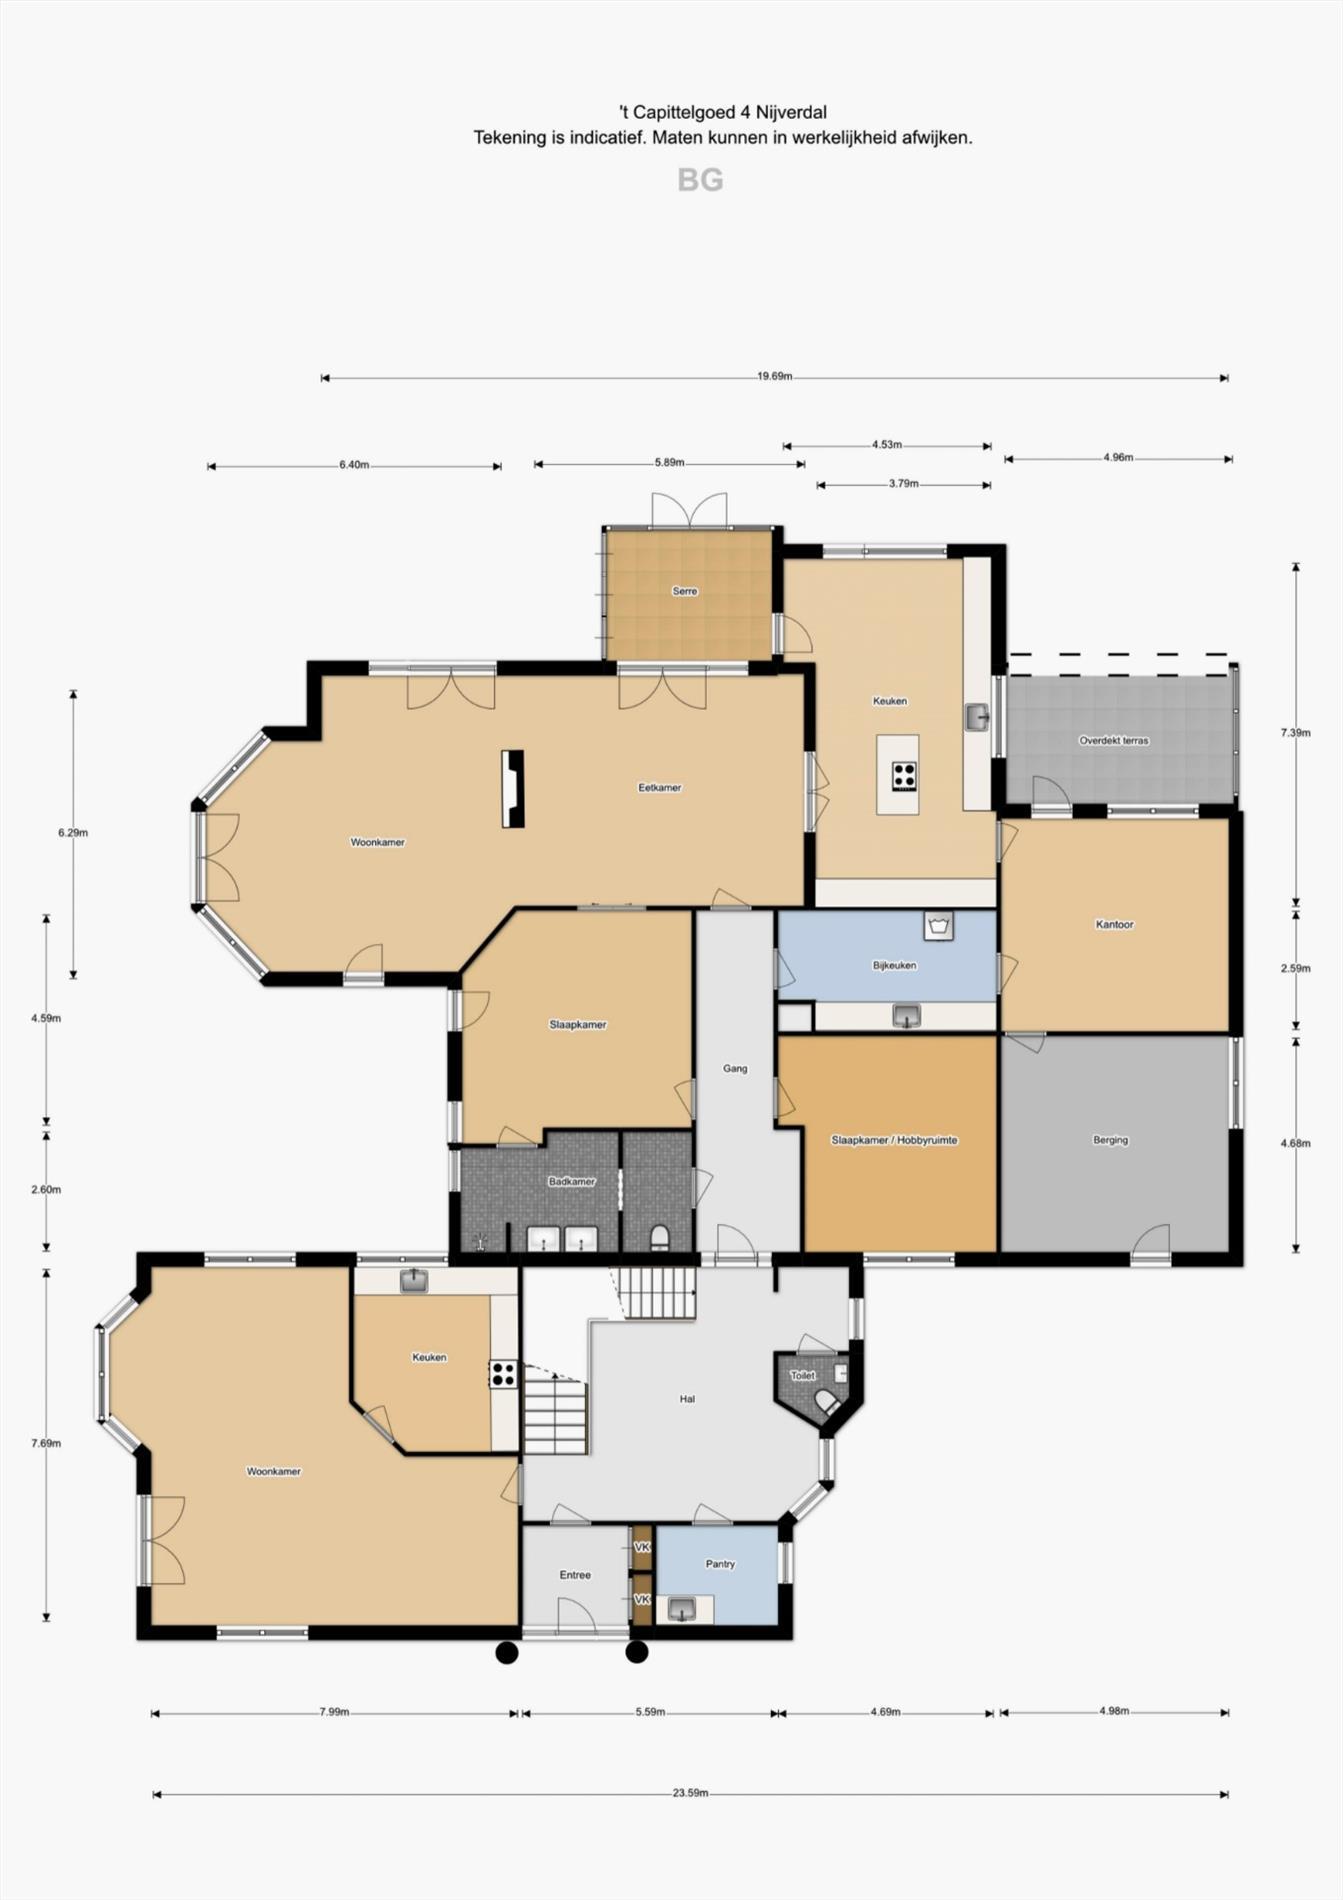 Floorplan - 'T Capittelgoed 4, 7441 DK Nijverdal